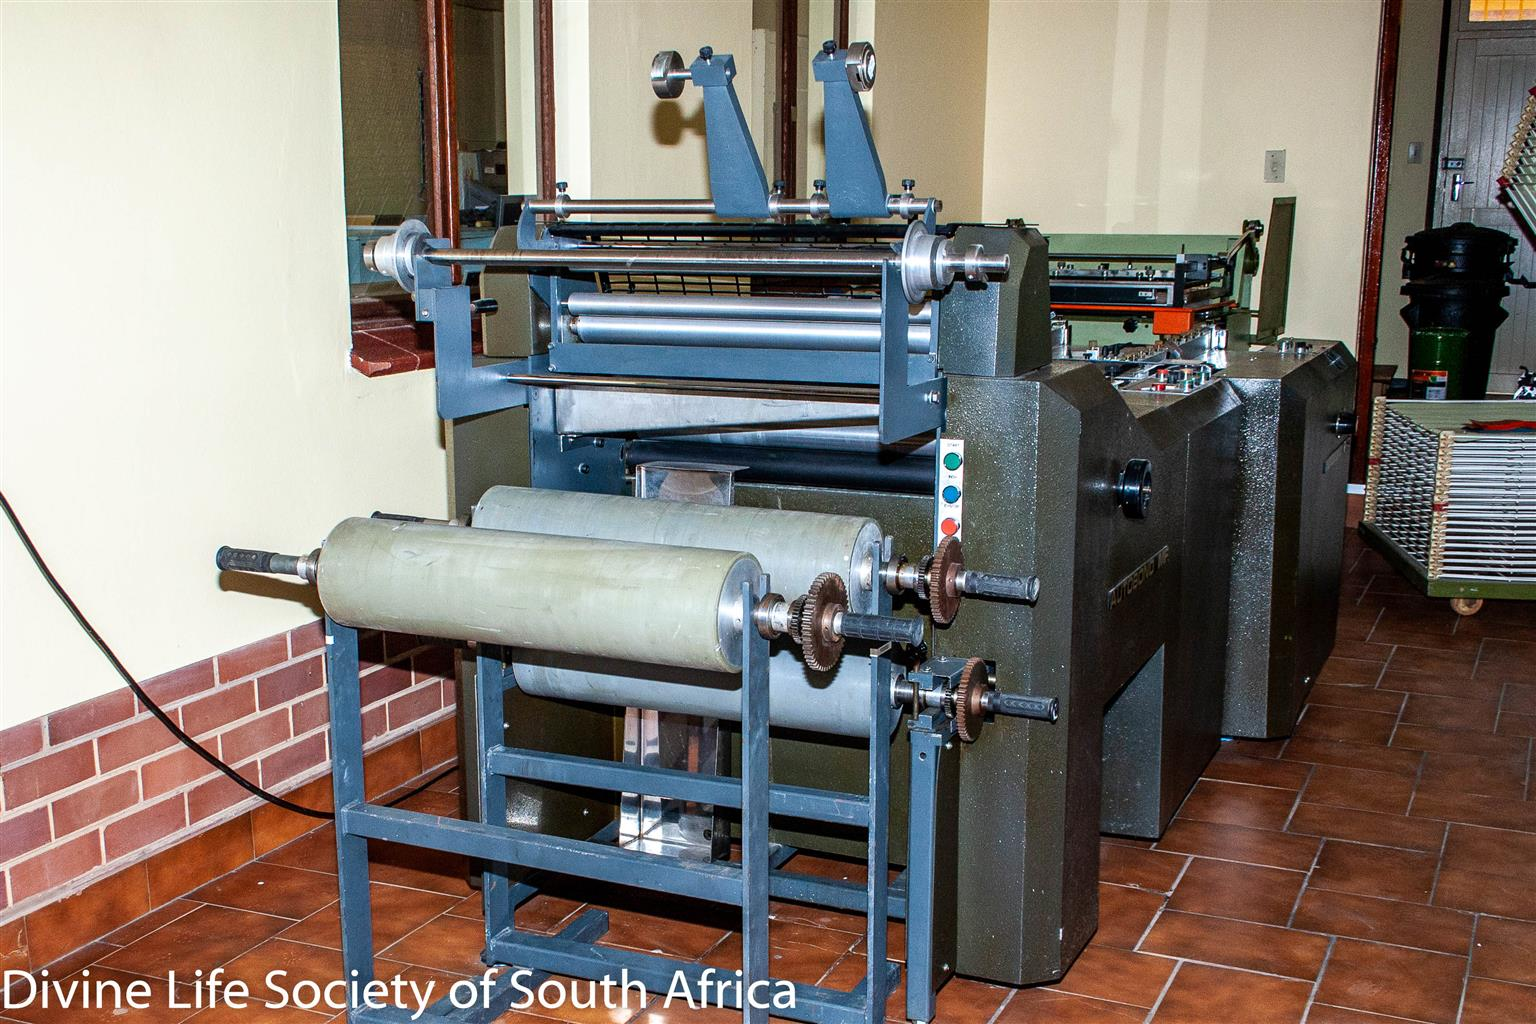 Autobond Industrial cold glue laminating machine